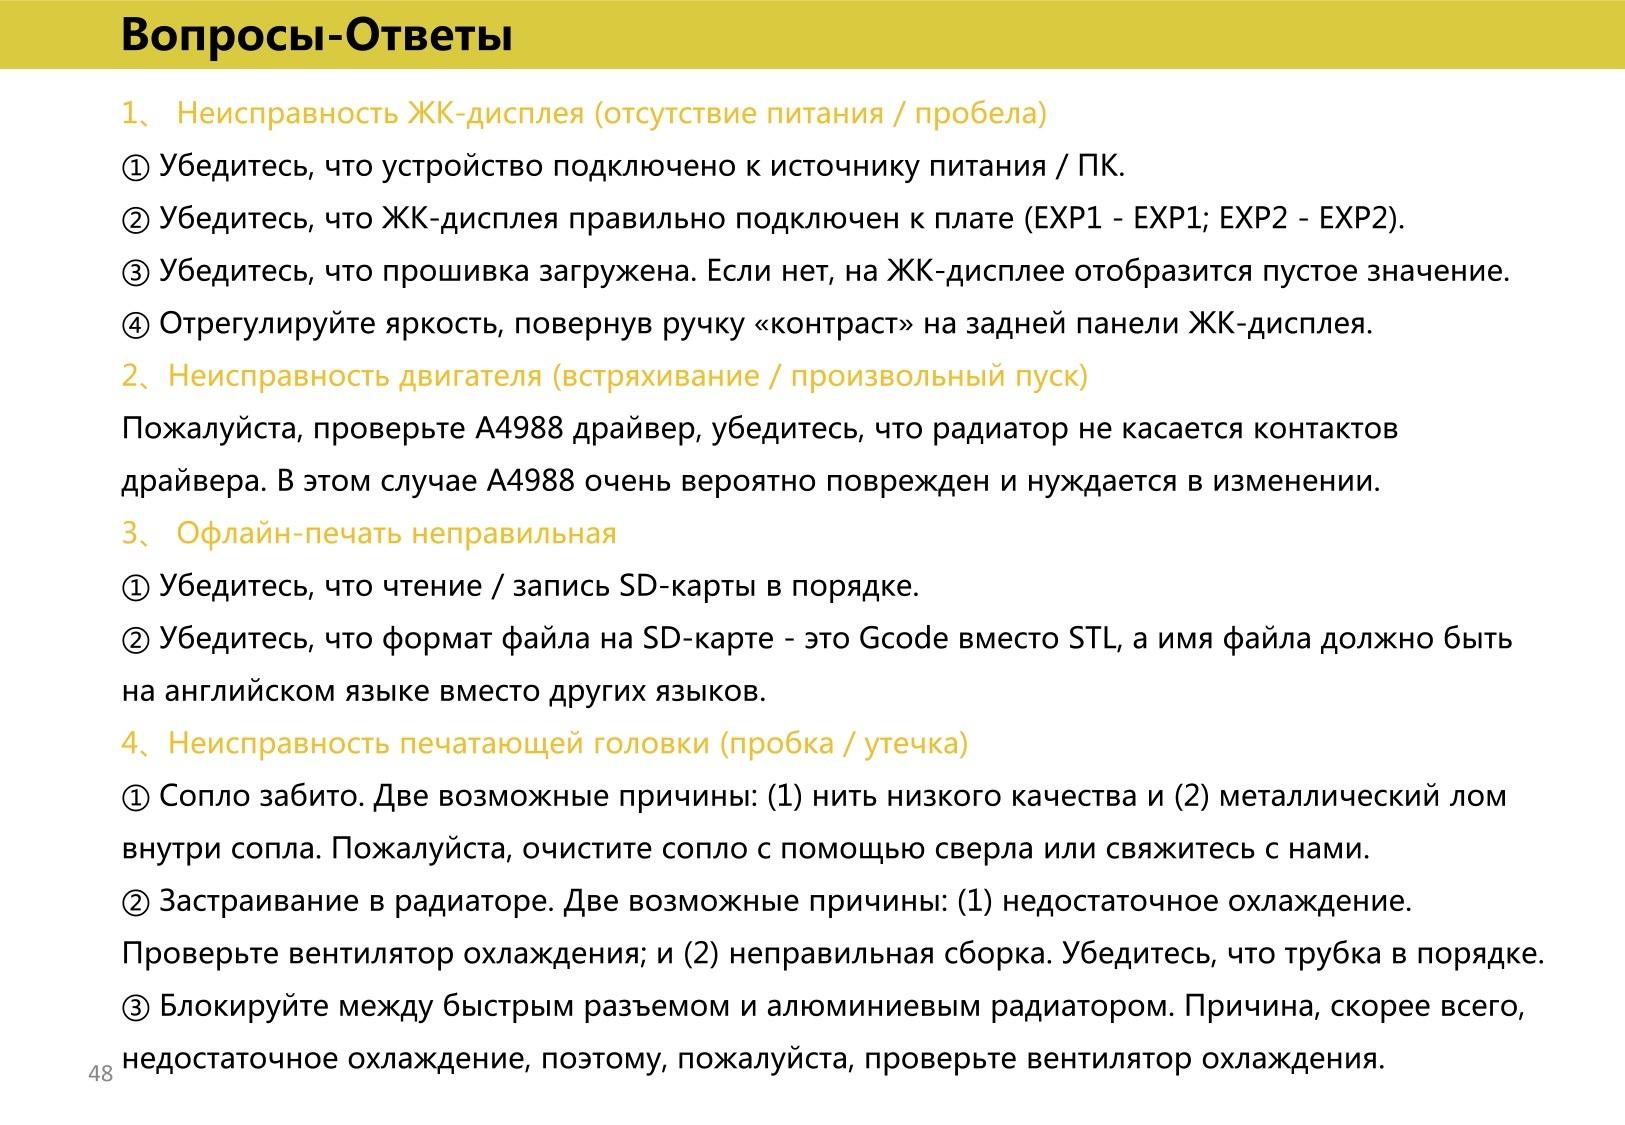 Инструкция Anycubic Kossel на русском языке